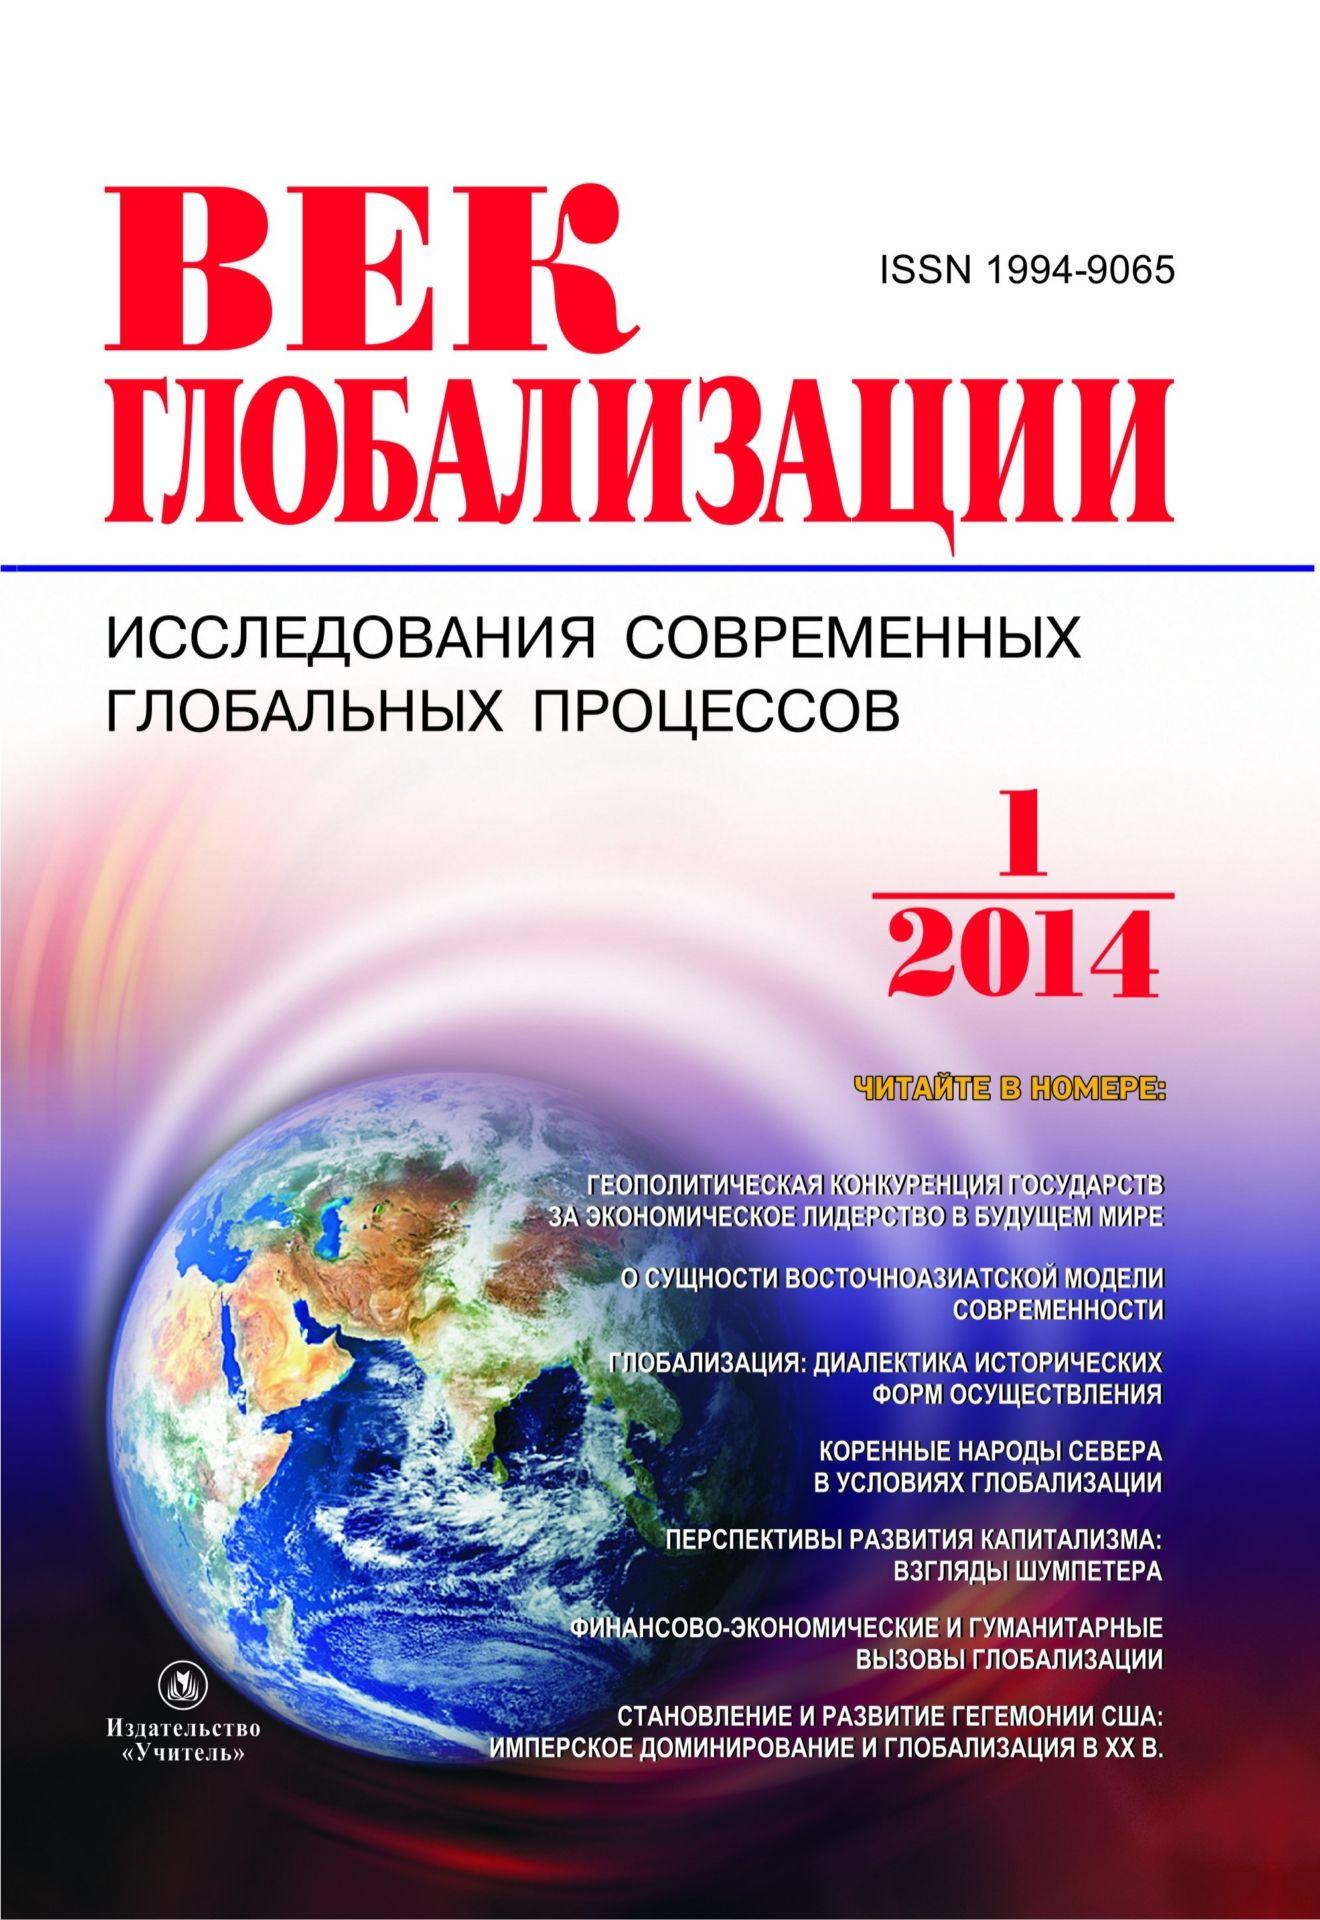 Журнал Век глобализации № 1 2014